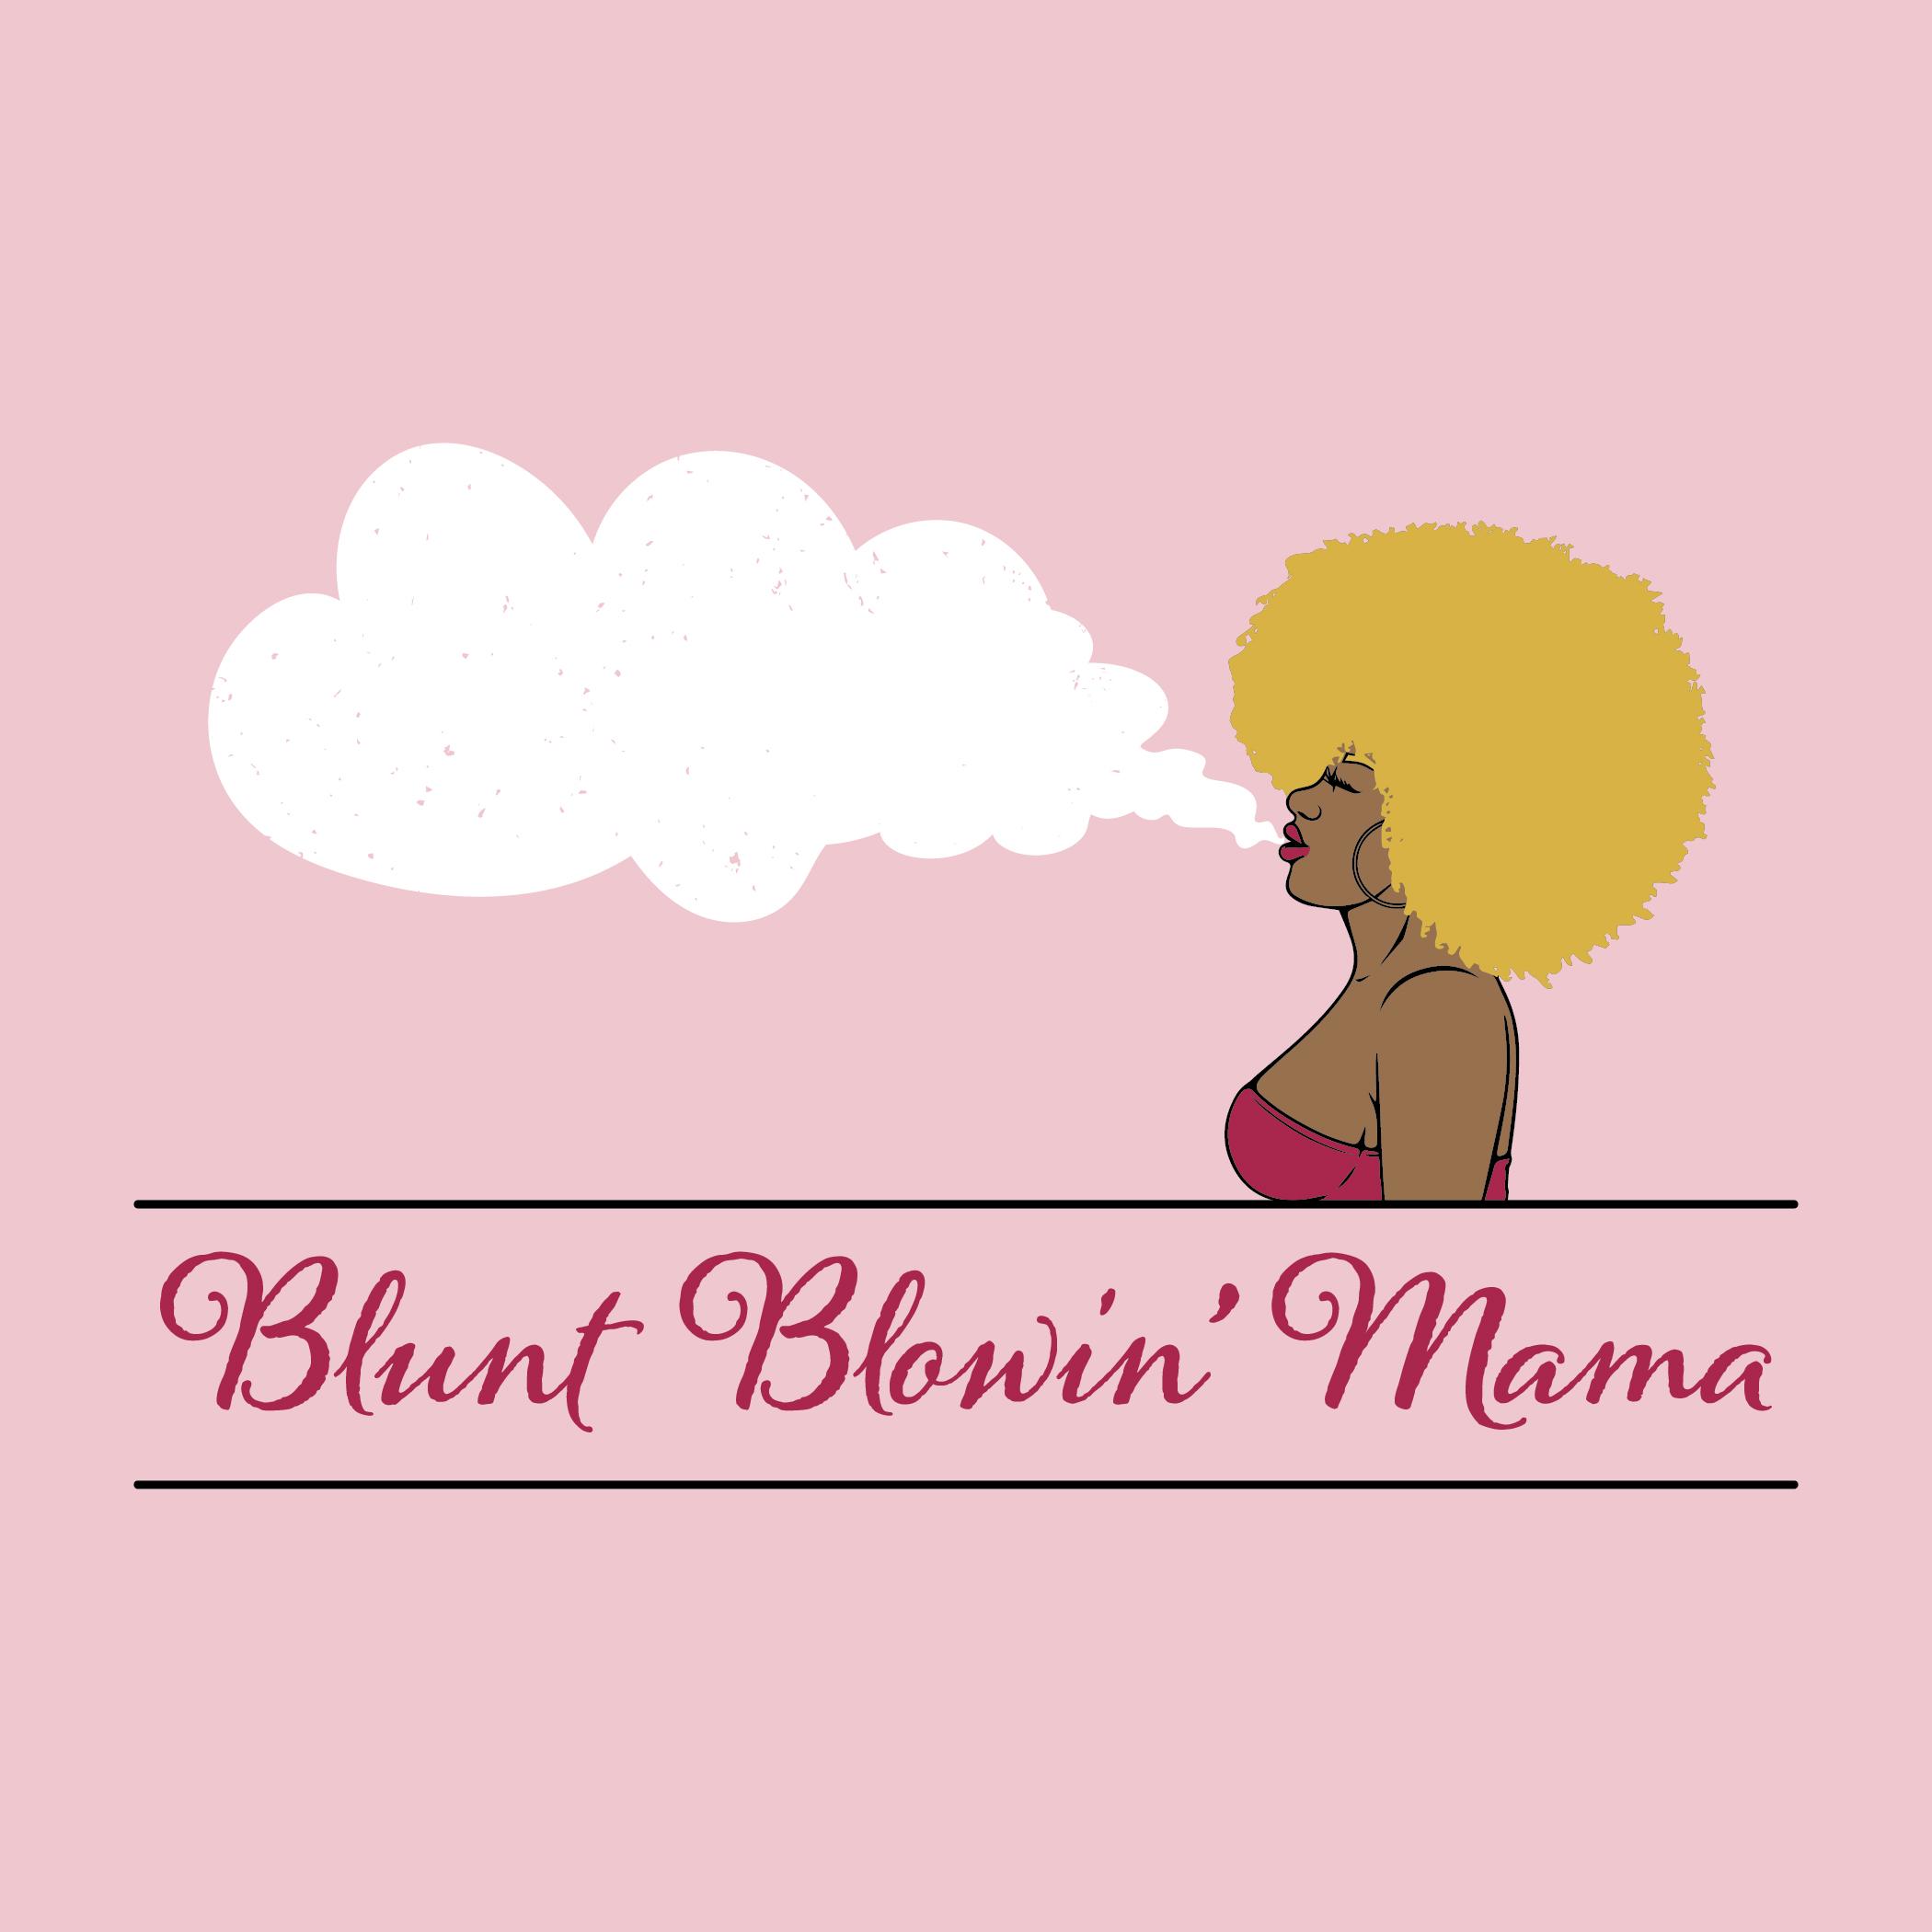 Blunt Blowin' Mama show art